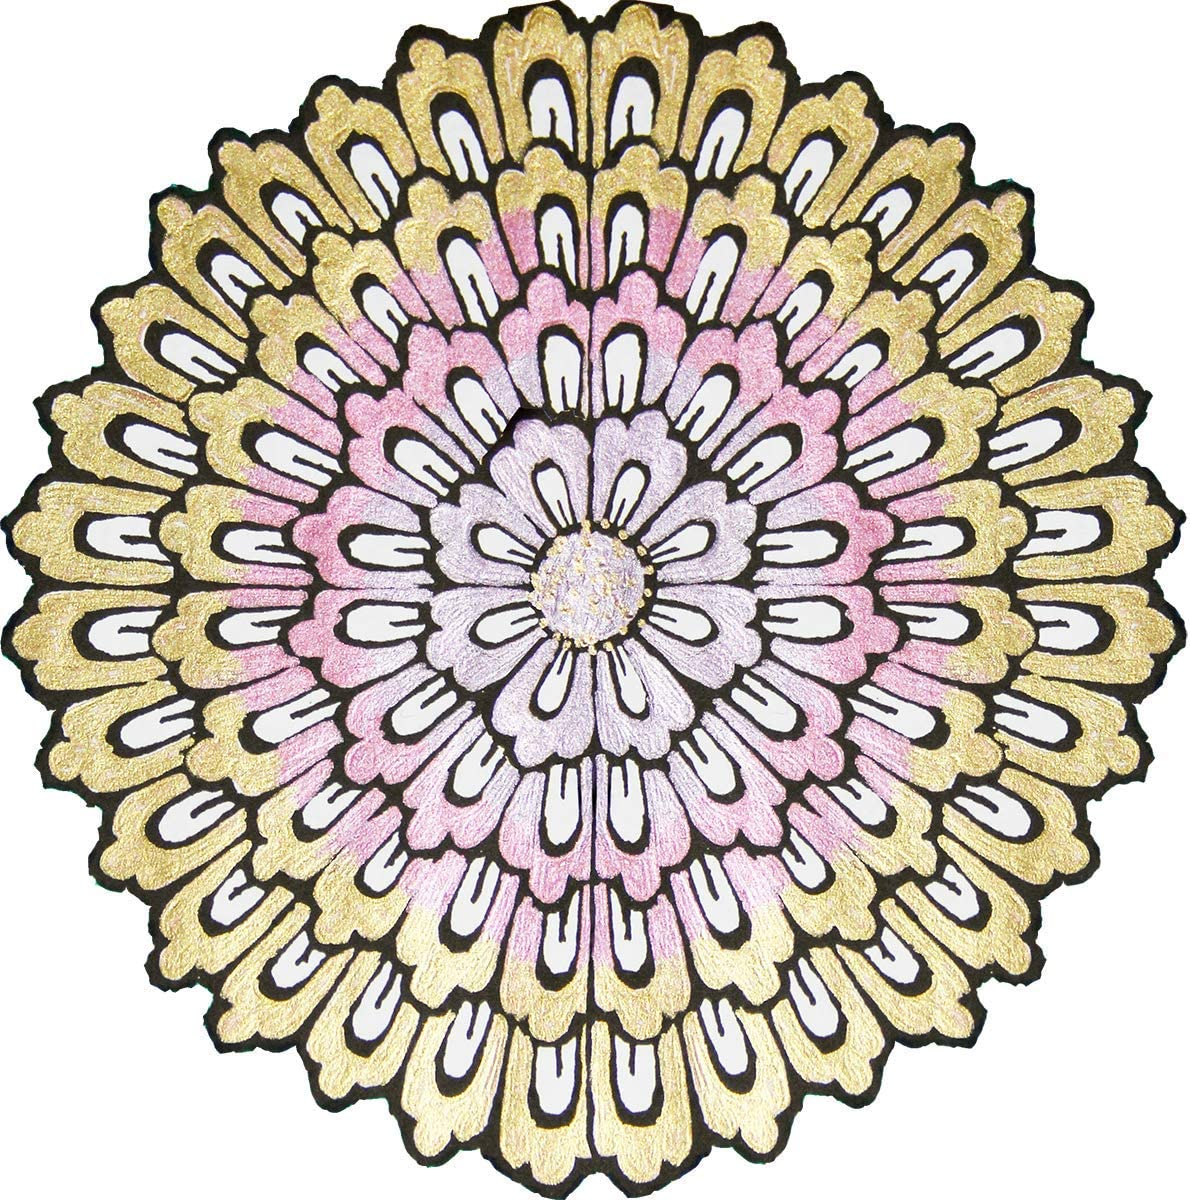 Sakura 57370 10-Piece Gelly Roll Blister Card Assorted Colors Metallic Gel Ink Pen Set,Multi Colored-10 Piece 2 Pack